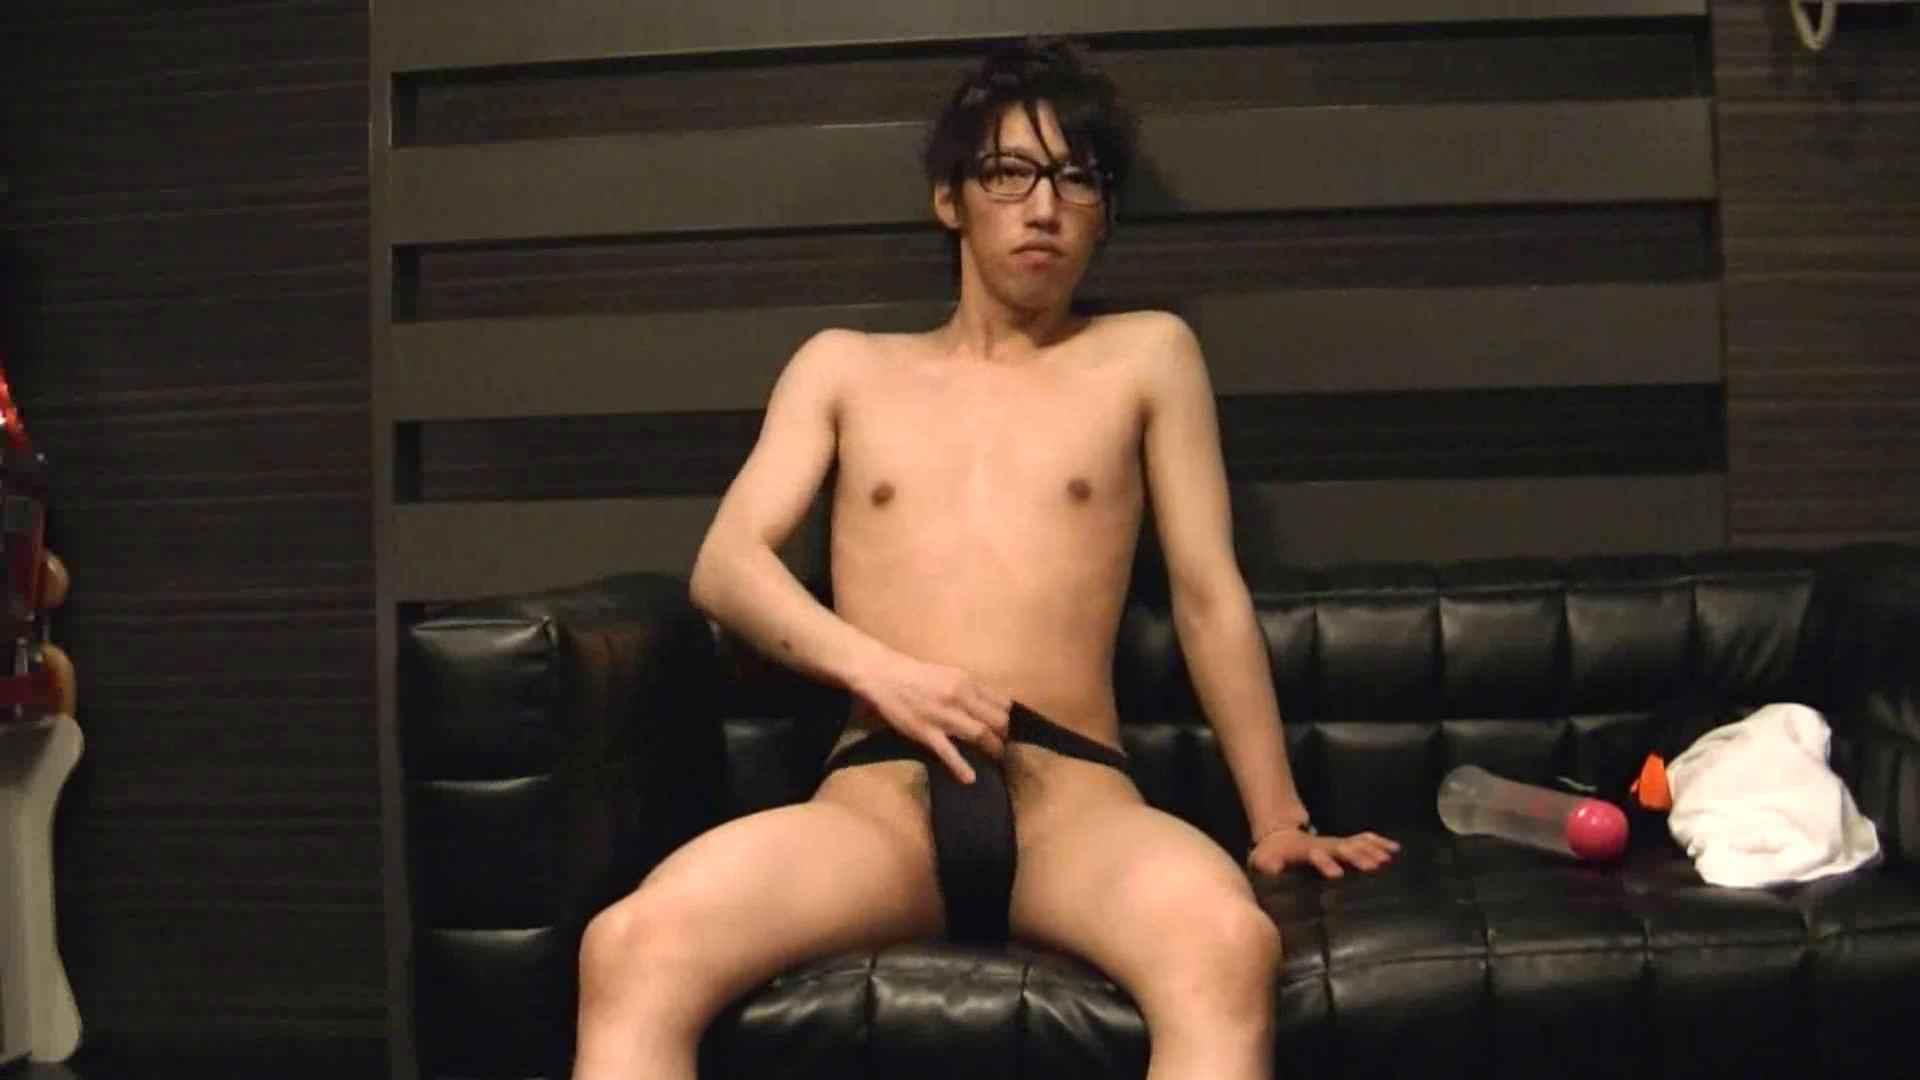 ONA見せカーニバル!! Vol3 男 ゲイ無料無修正画像 89枚 25